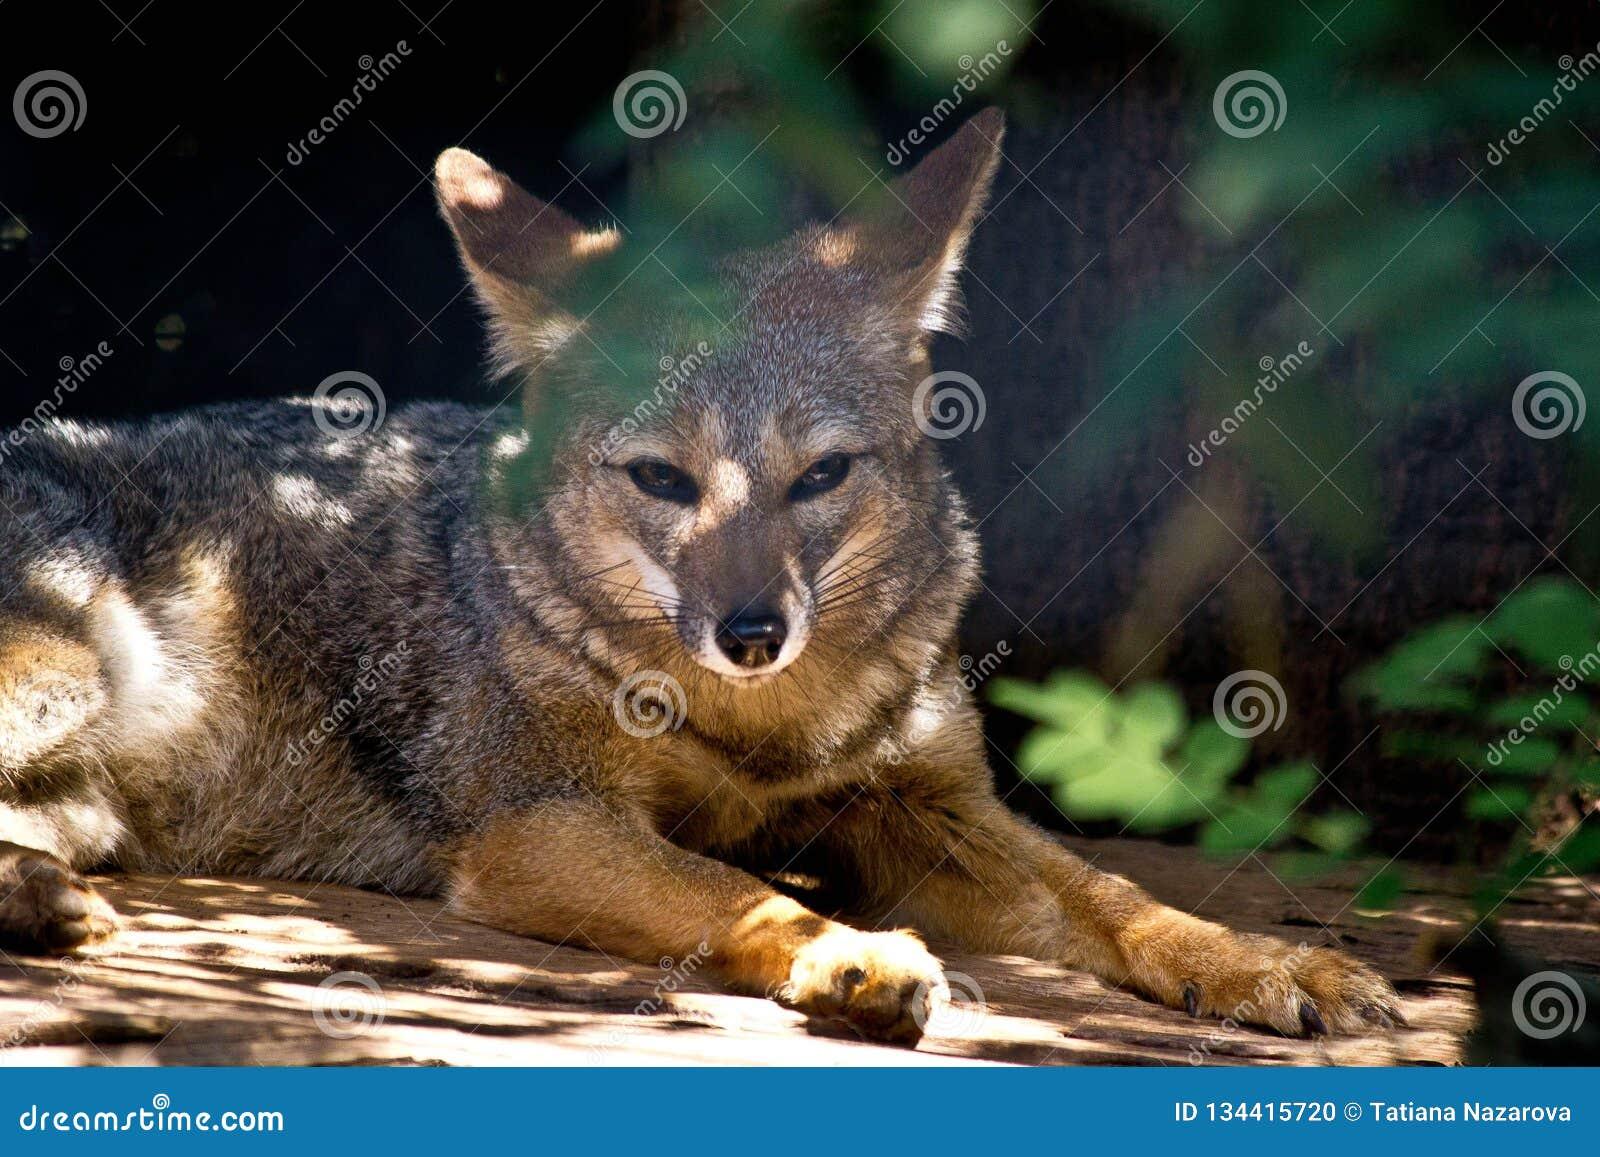 Wild fox at the zoo